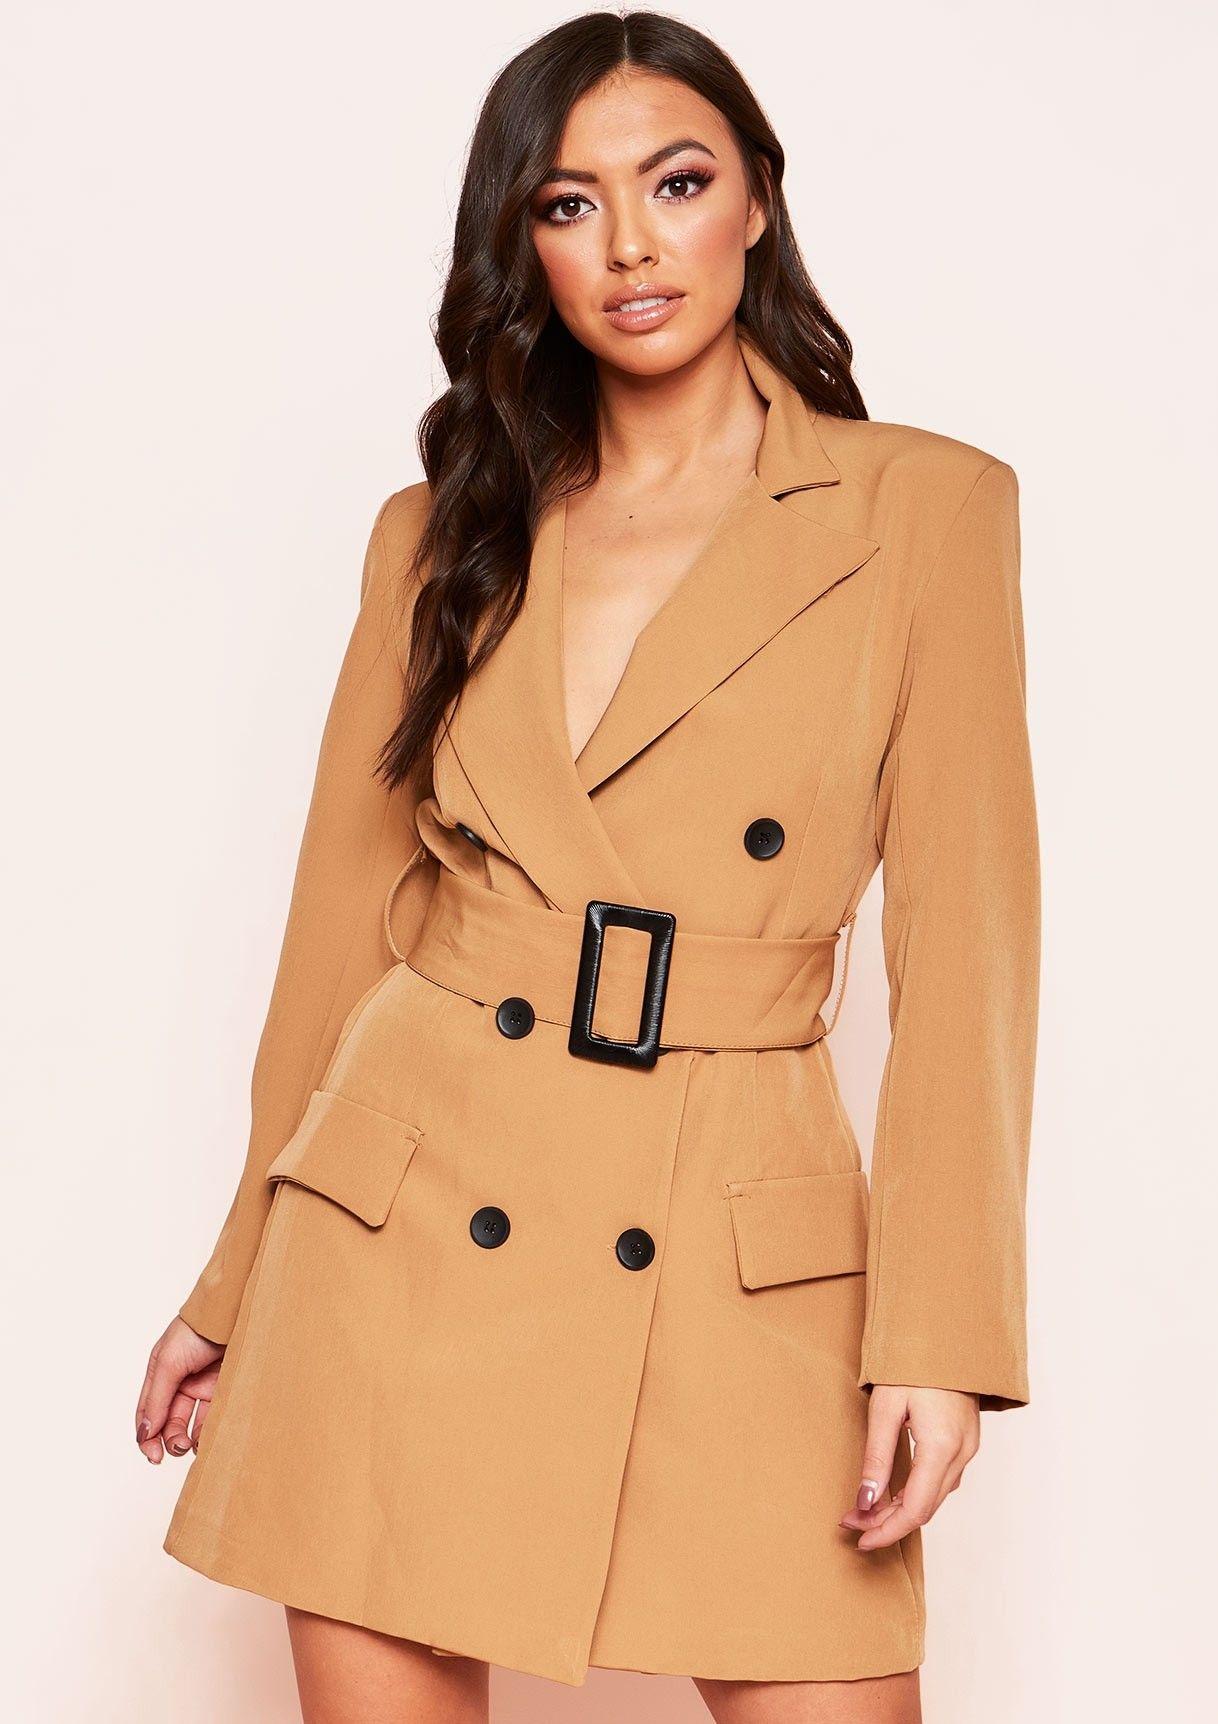 5d6e80ba99a8e Leandra Camel Belted Blazer Dress in 2019 | TREND REPORT FEB 2019 ...